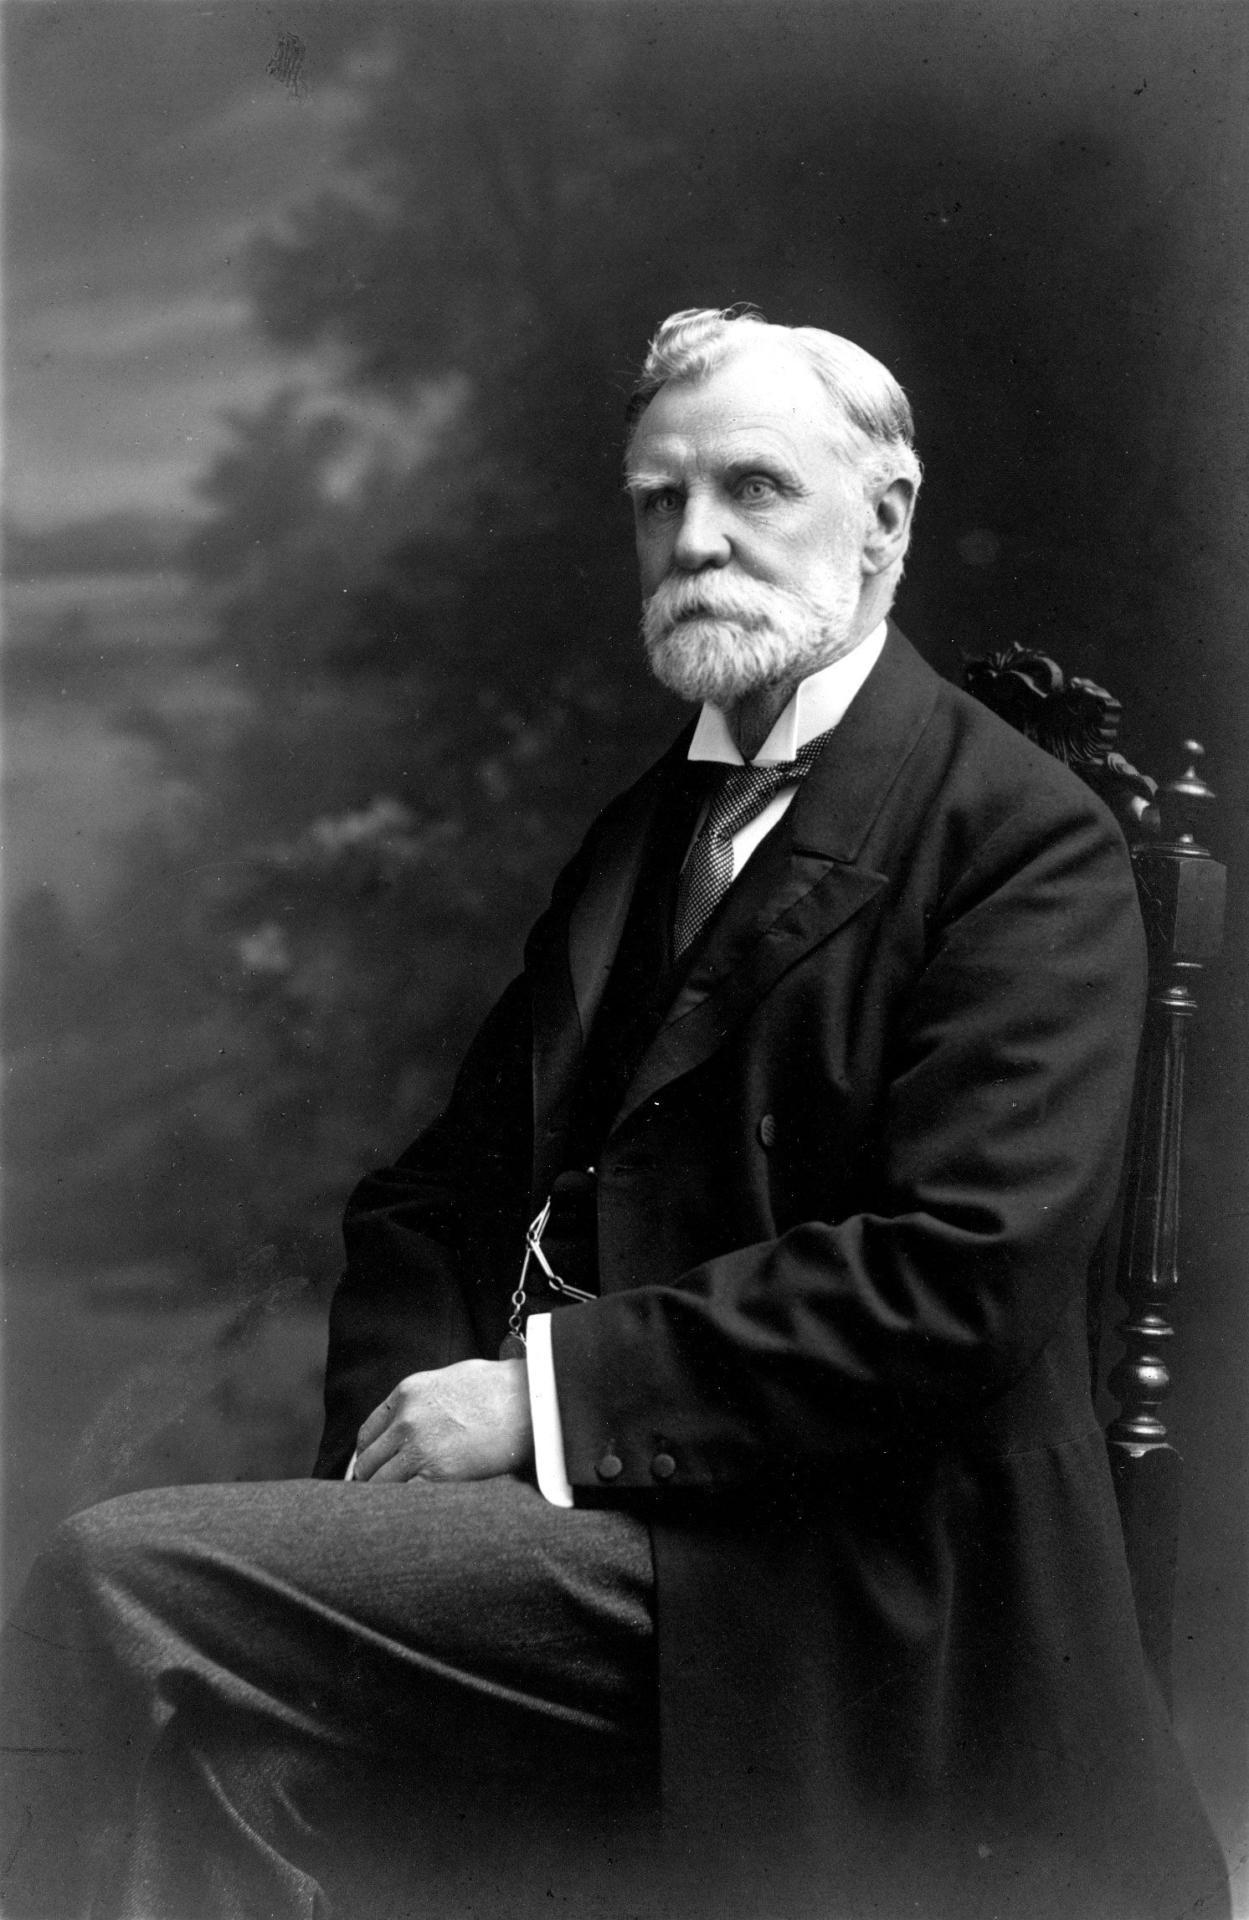 Black and white photograph of Robert Ropner